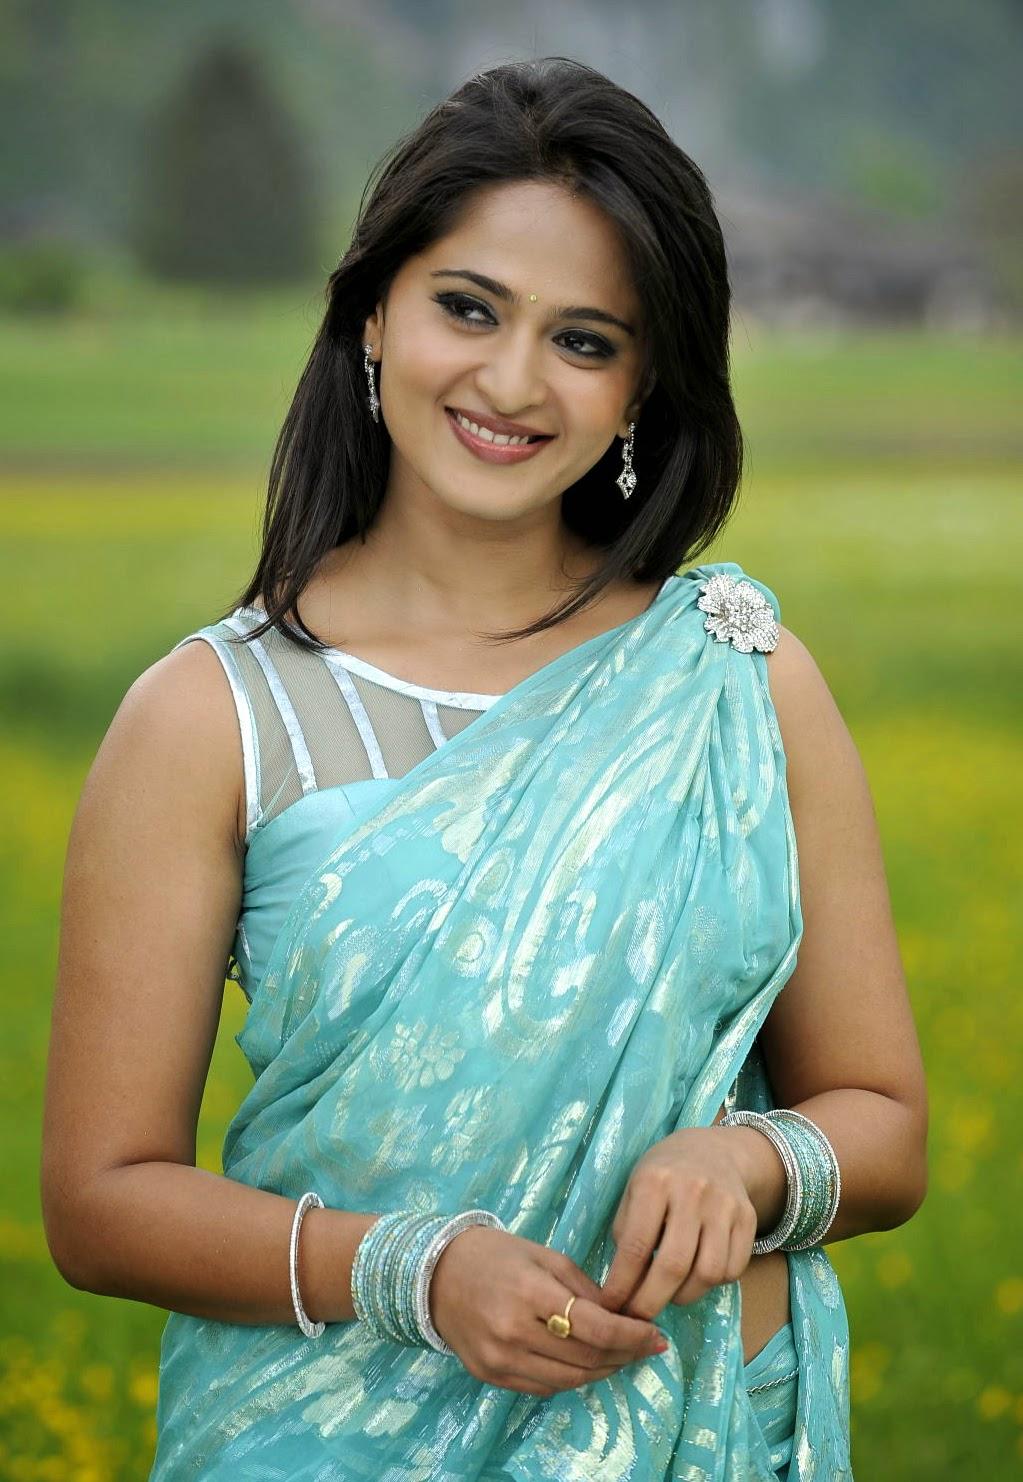 Anushka Hot In Saree Hd Wallpapers Hd Wallpapers Download-6784